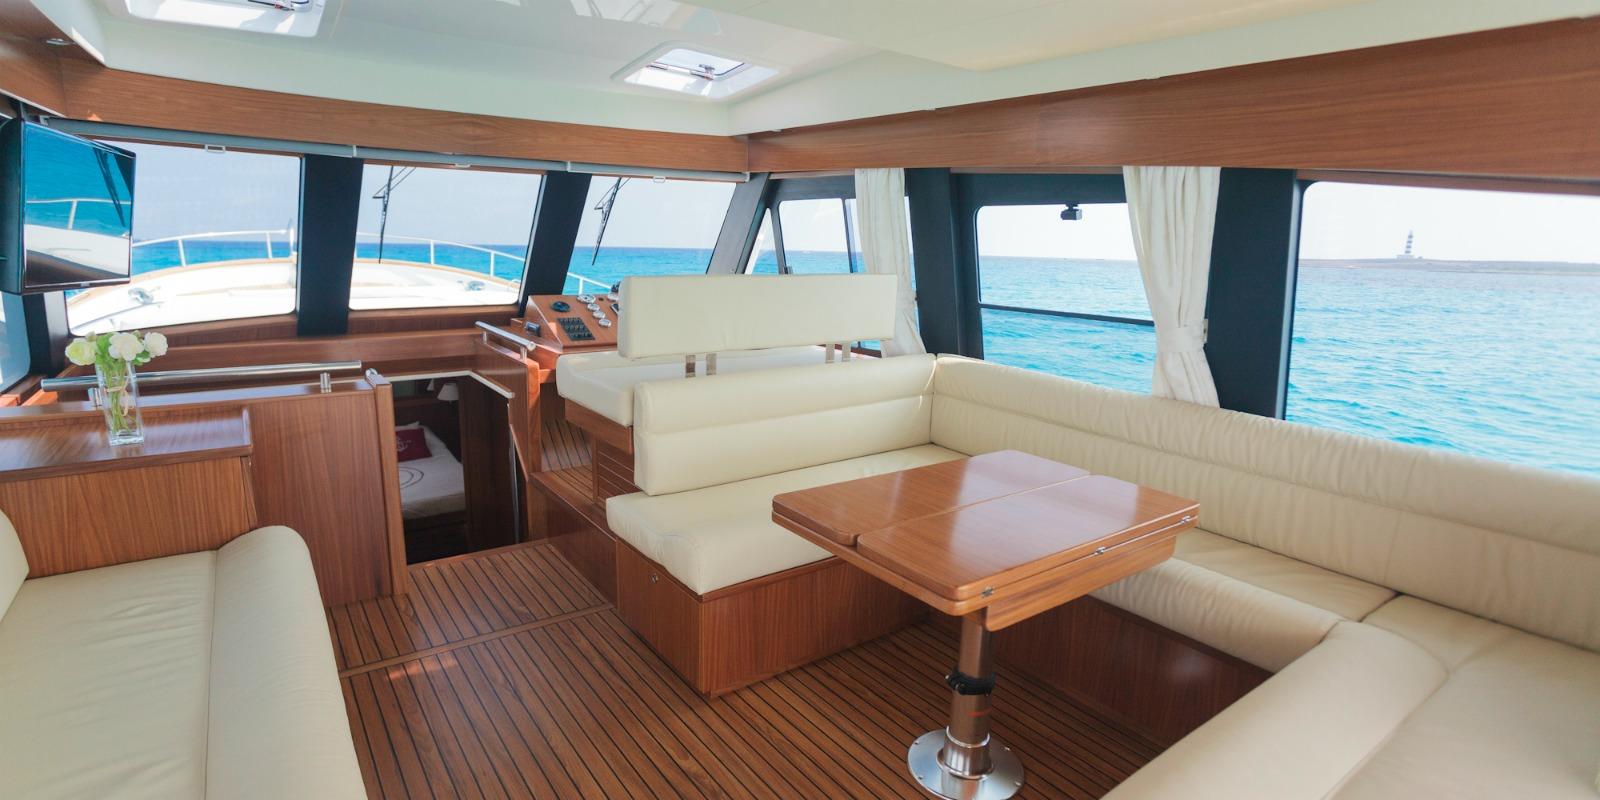 Minorca Islander 54 yacht for sale - salon